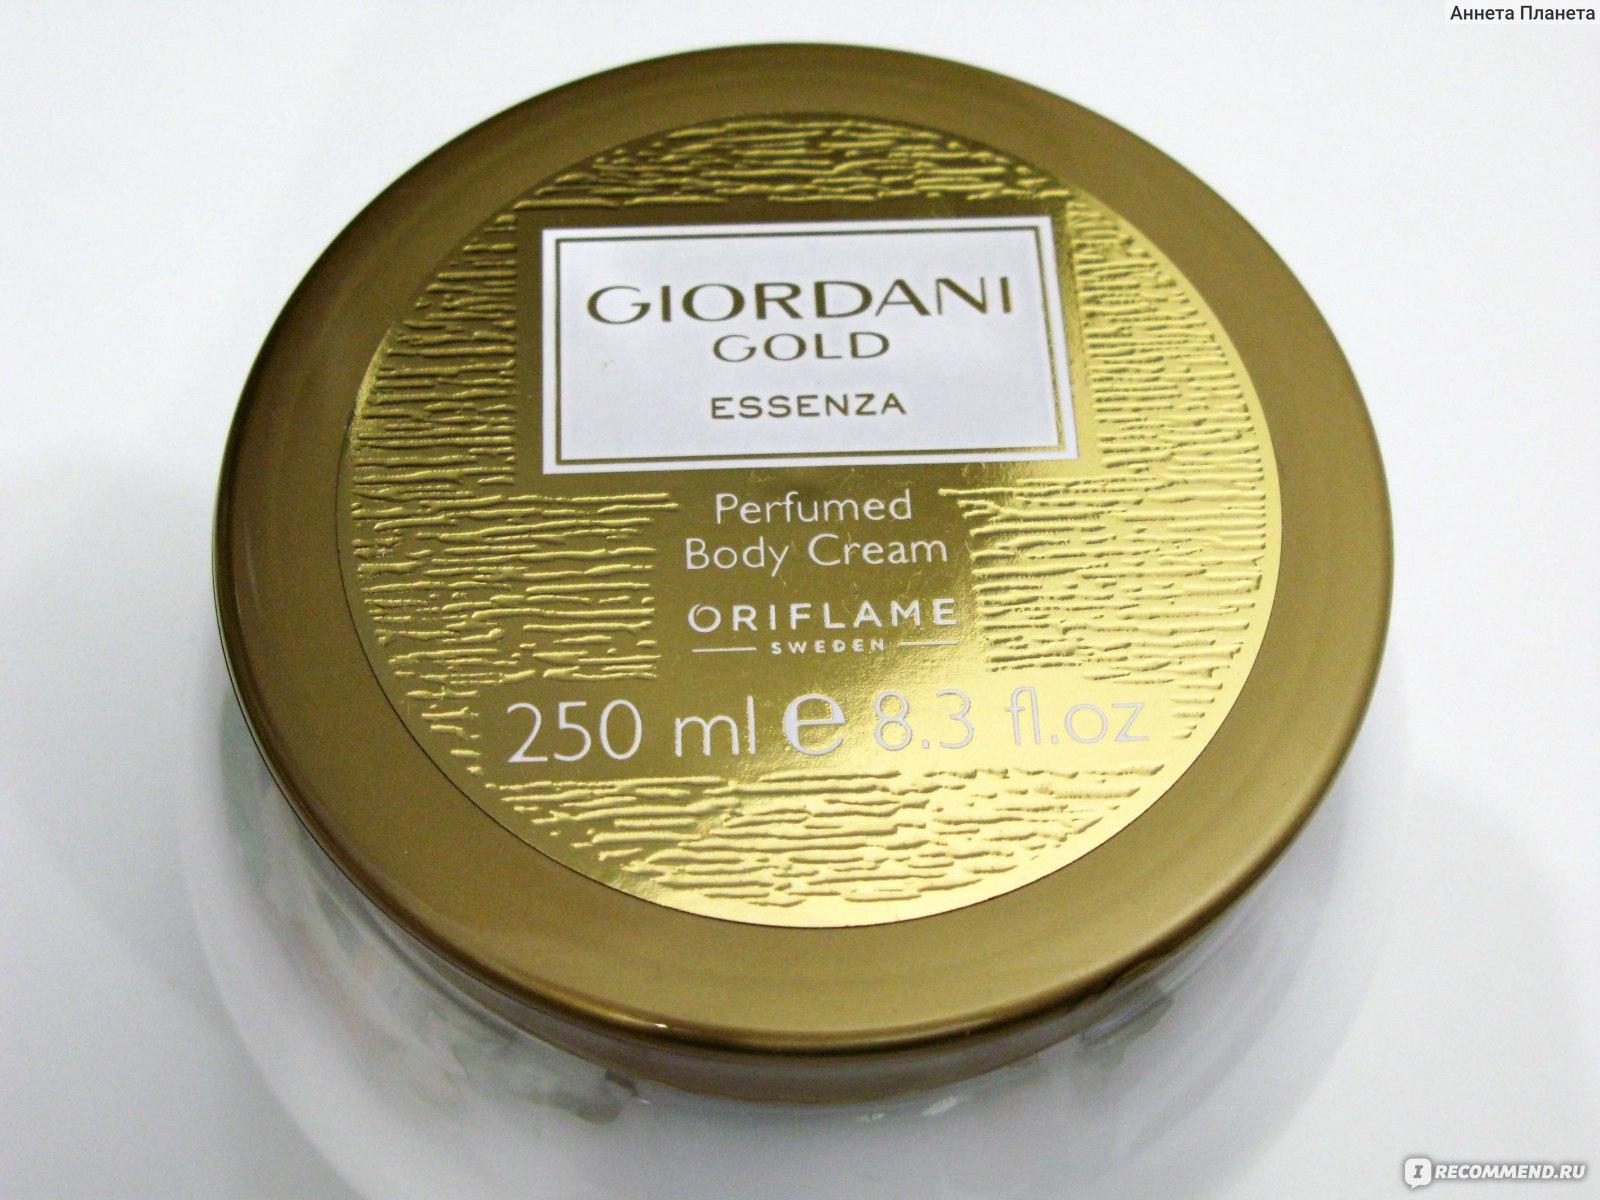 Oriflame Giordani Gold Essenza Body Cream